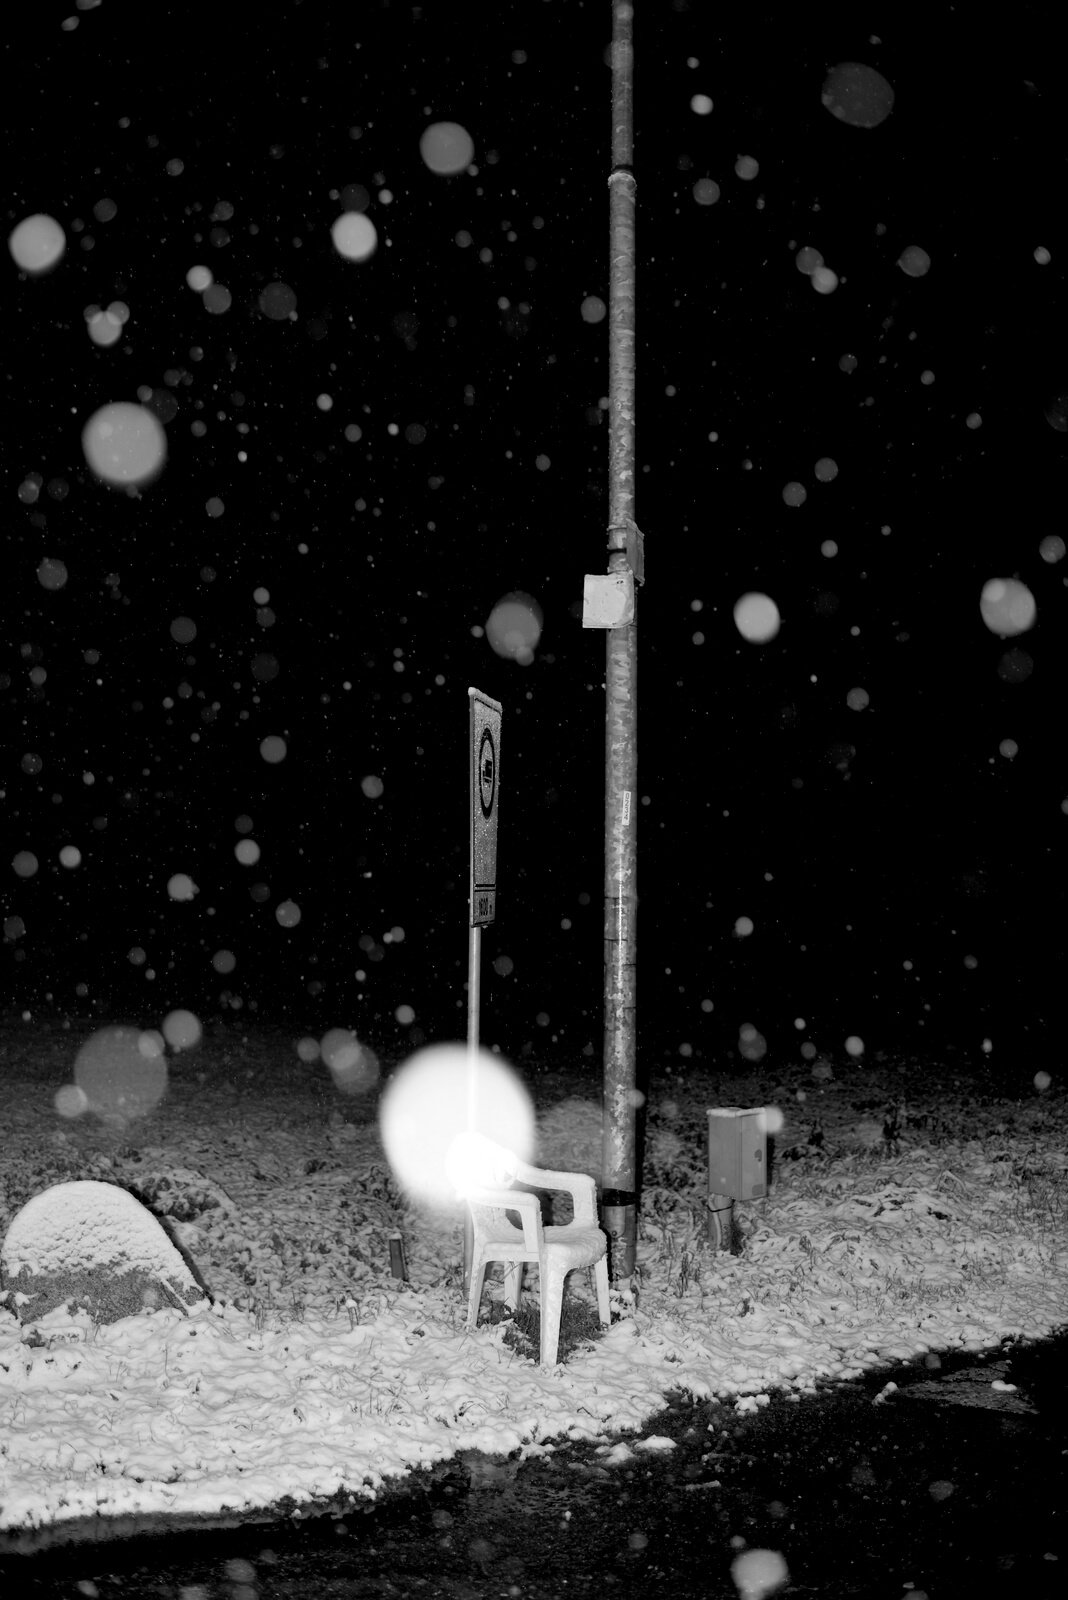 14_The-Absence_Attilio-Solzi